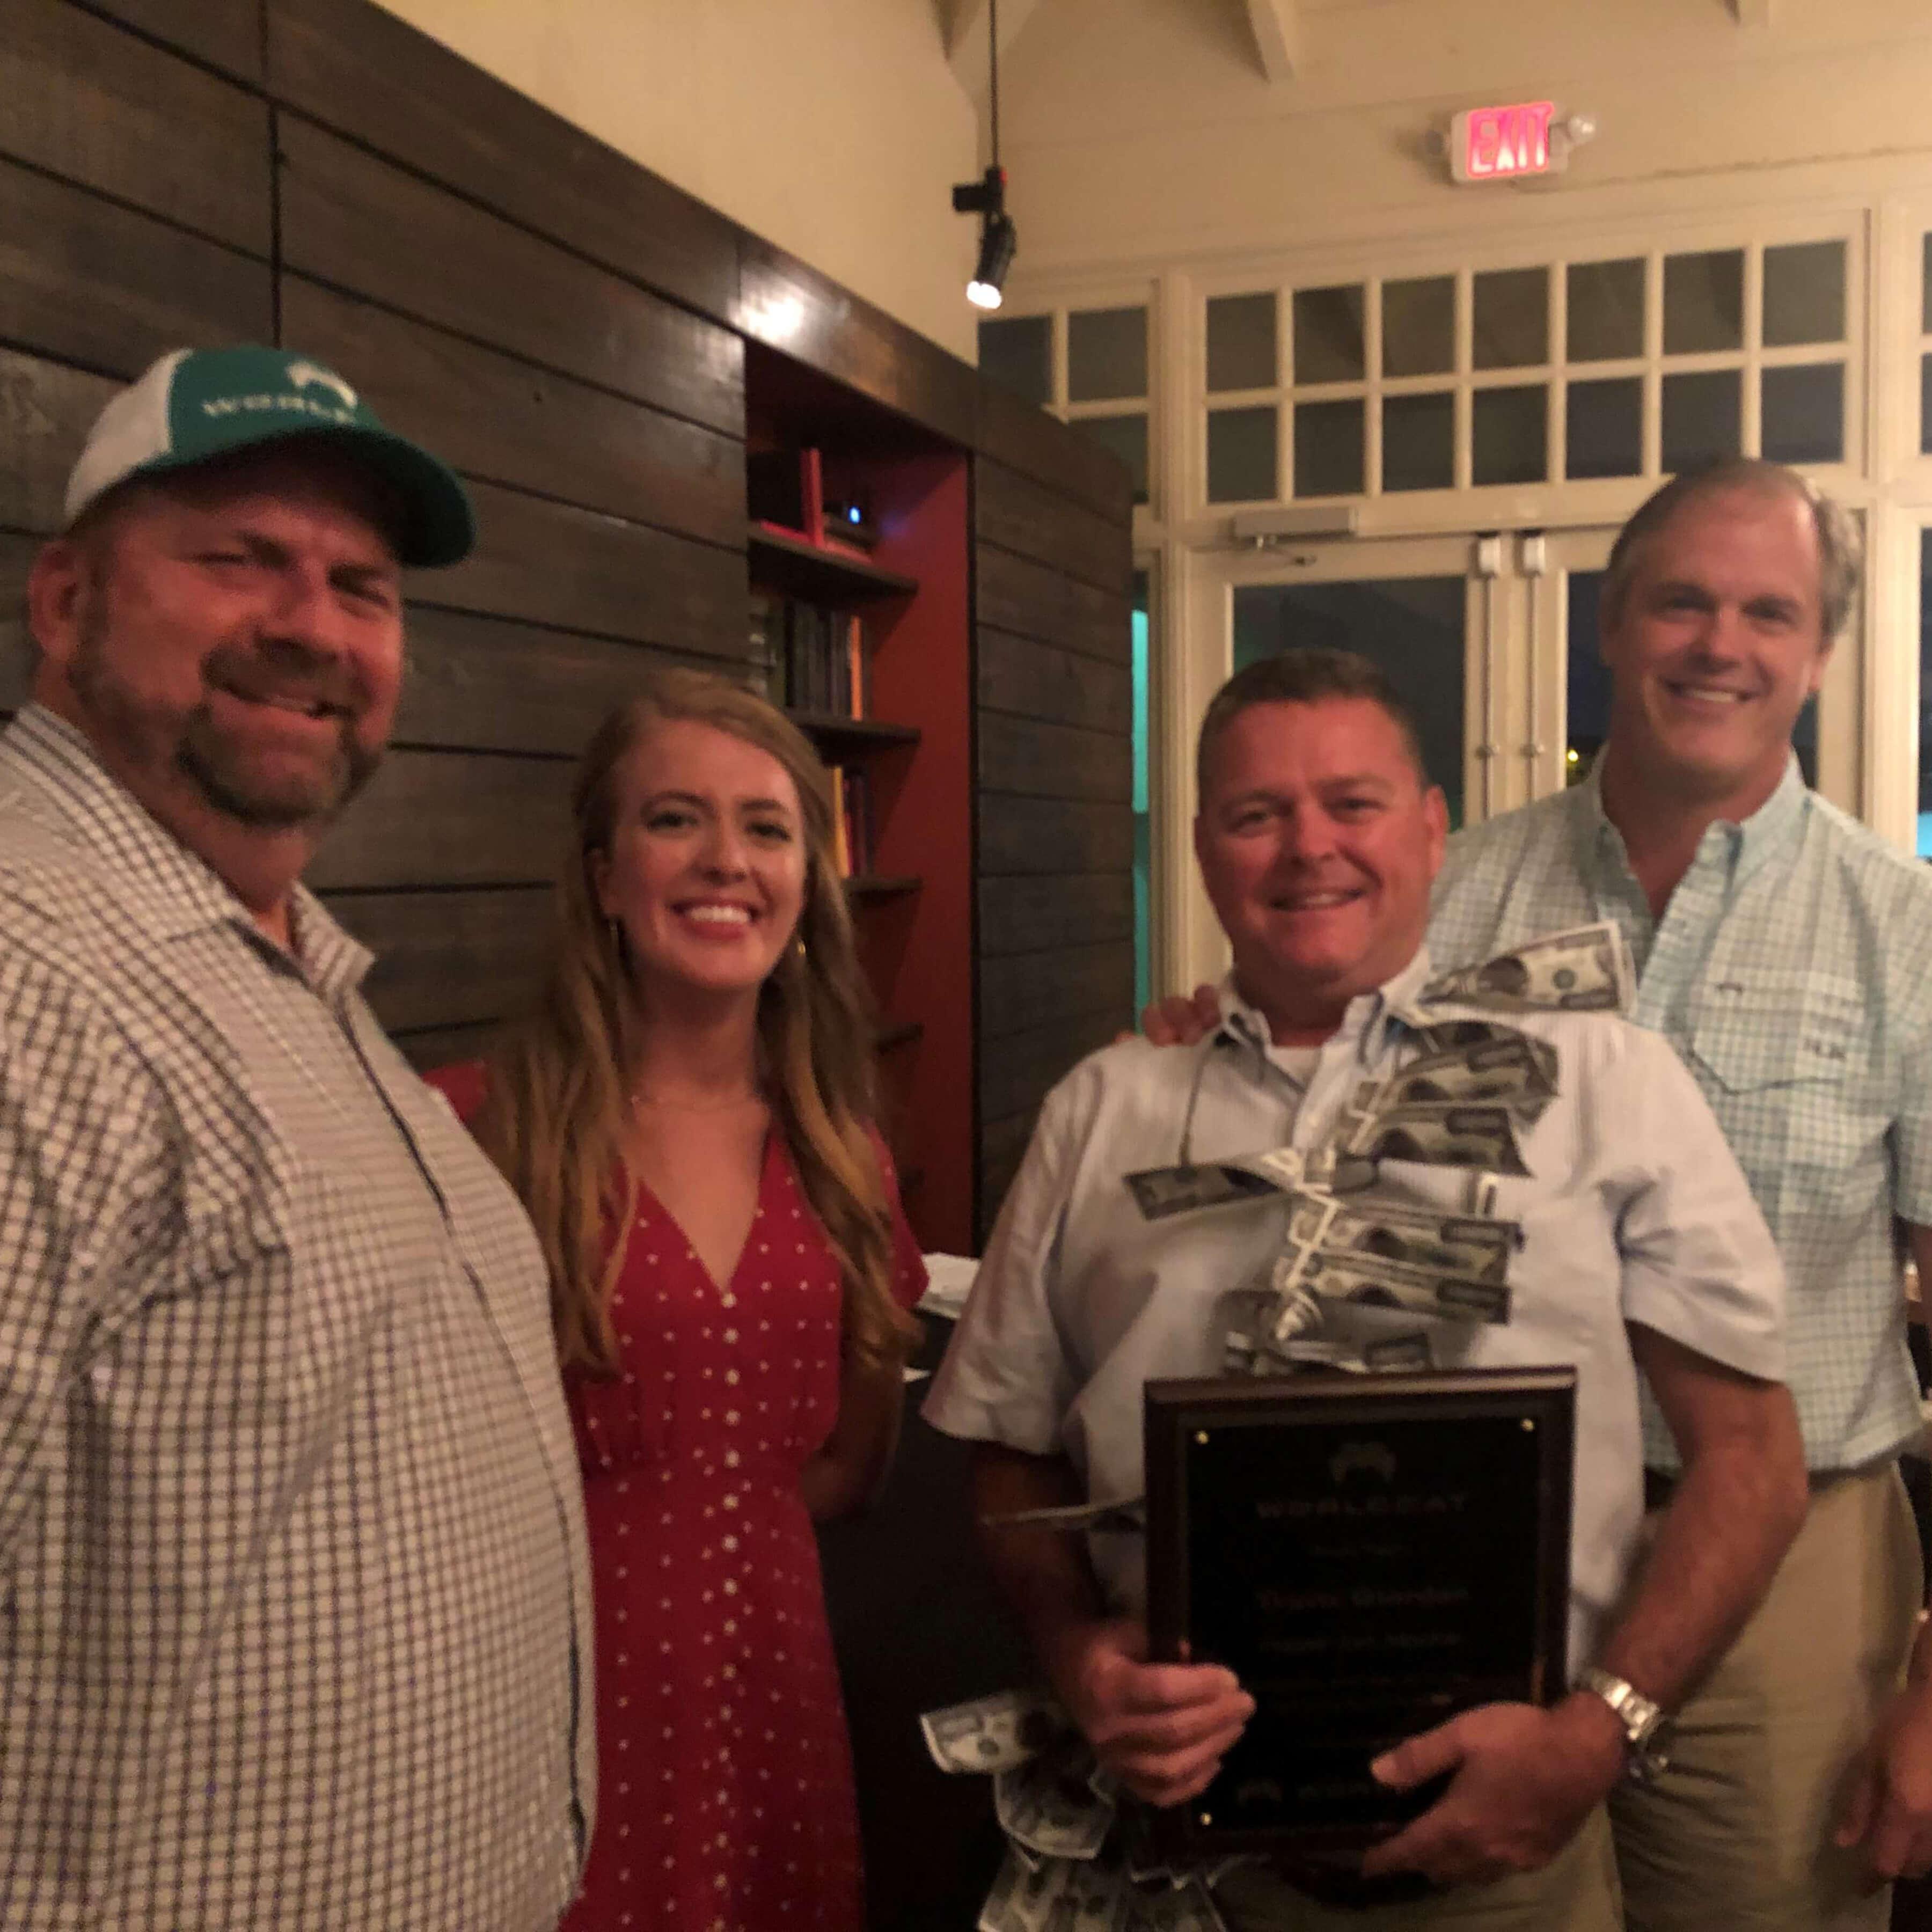 World Cat Dealer Meeting Award Travis Giordan